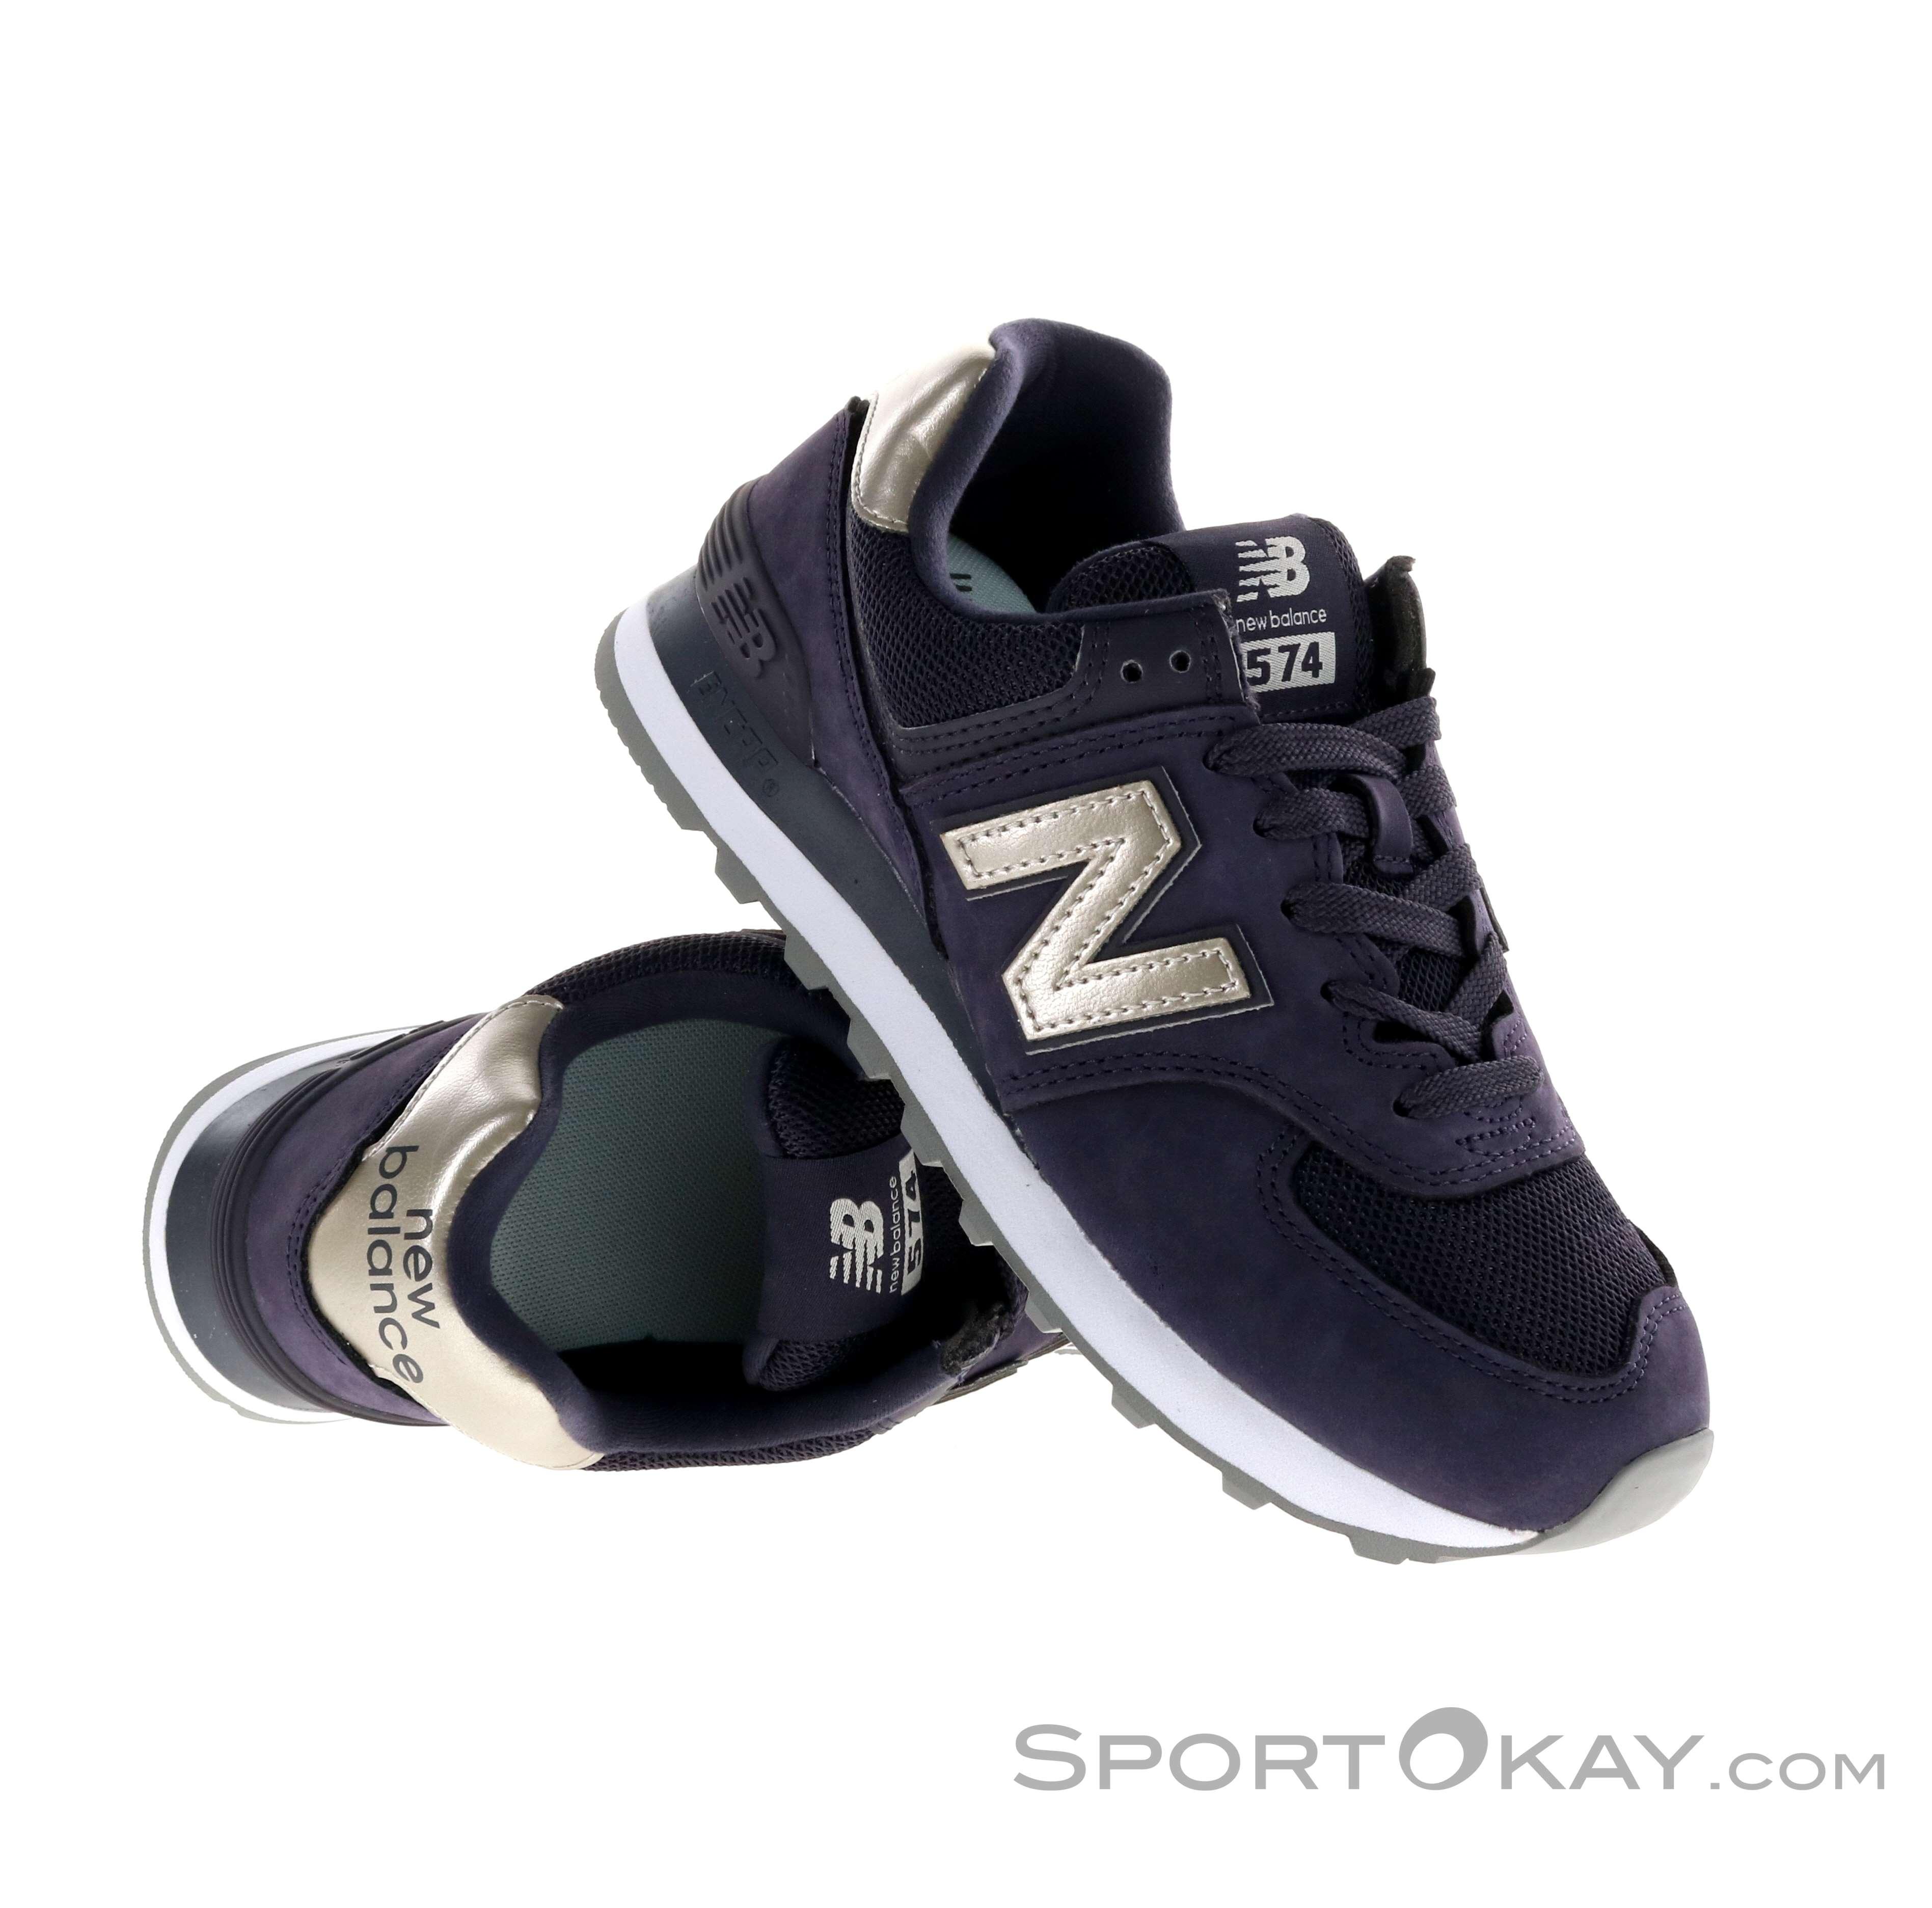 New Balance New Balance 574 Womens Leisure Shoes